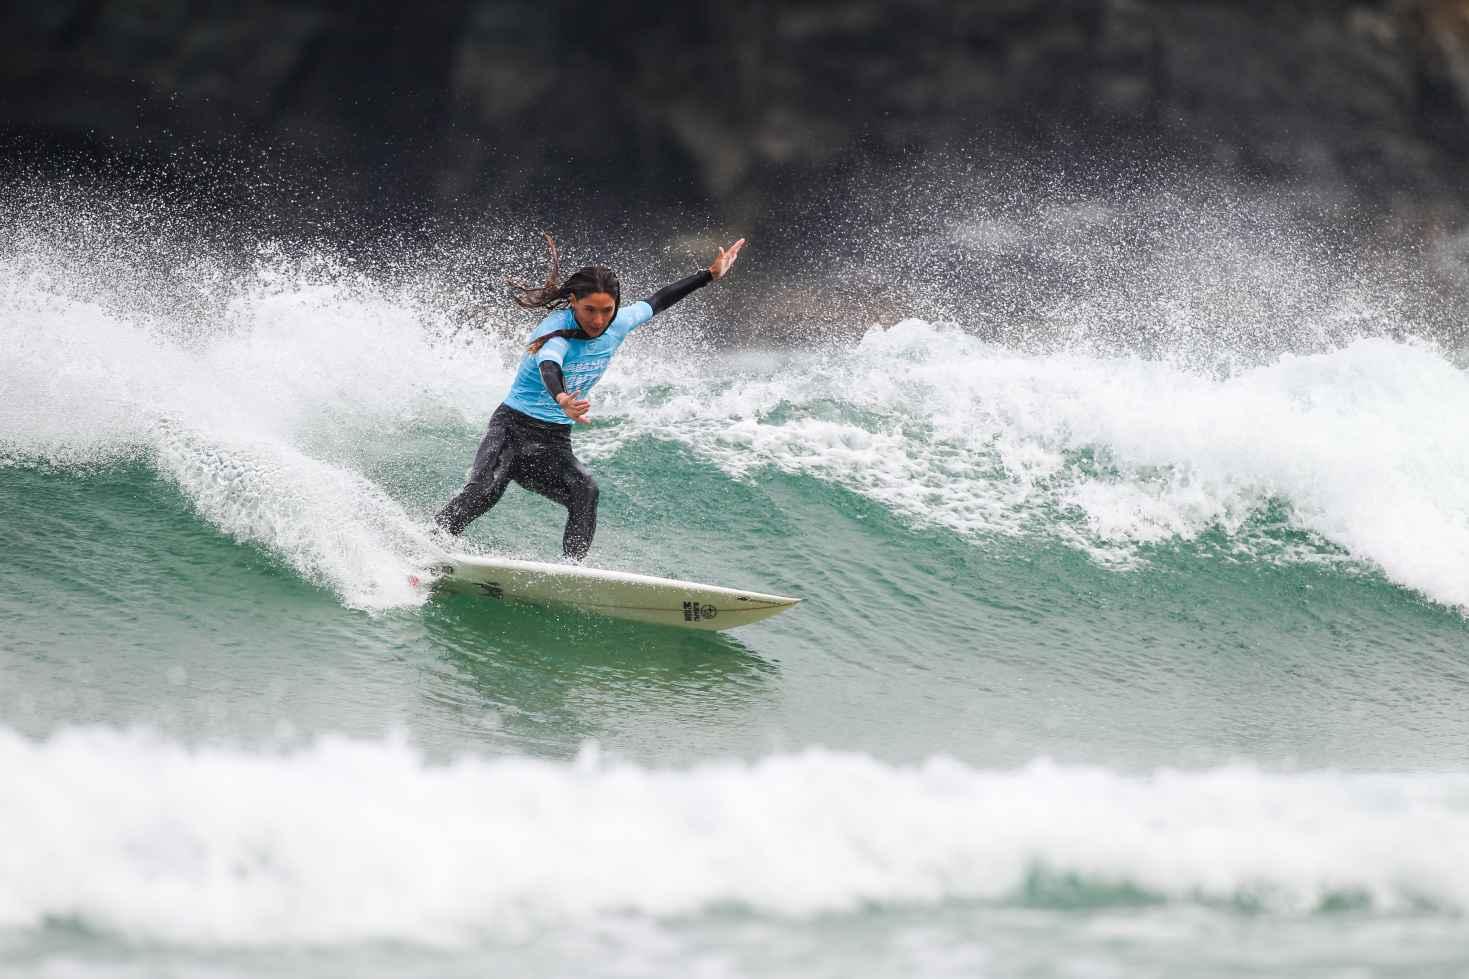 surf30 pantin classic 2021 wsl surf Garazi Sanchez Ortun 9763PantinClassic2021Masurel